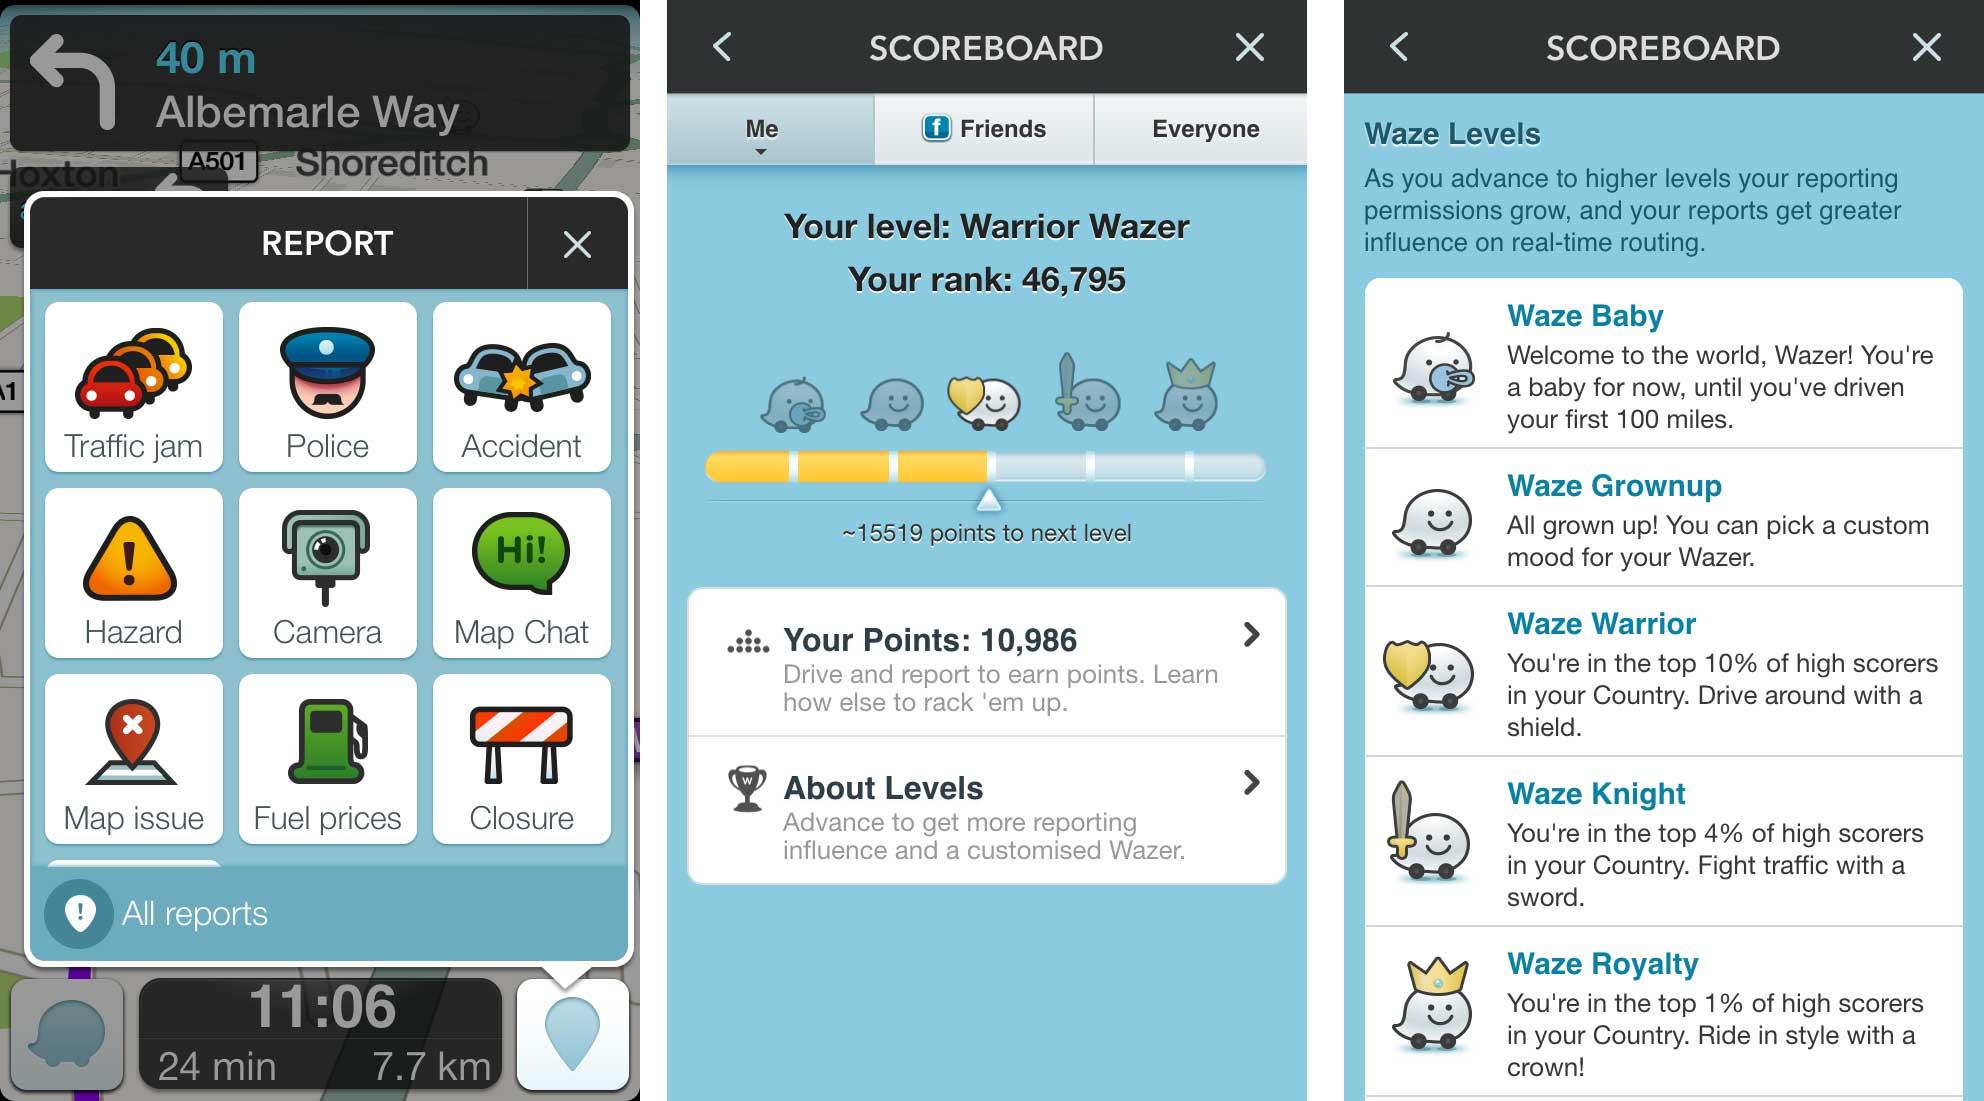 Waze app screen shots